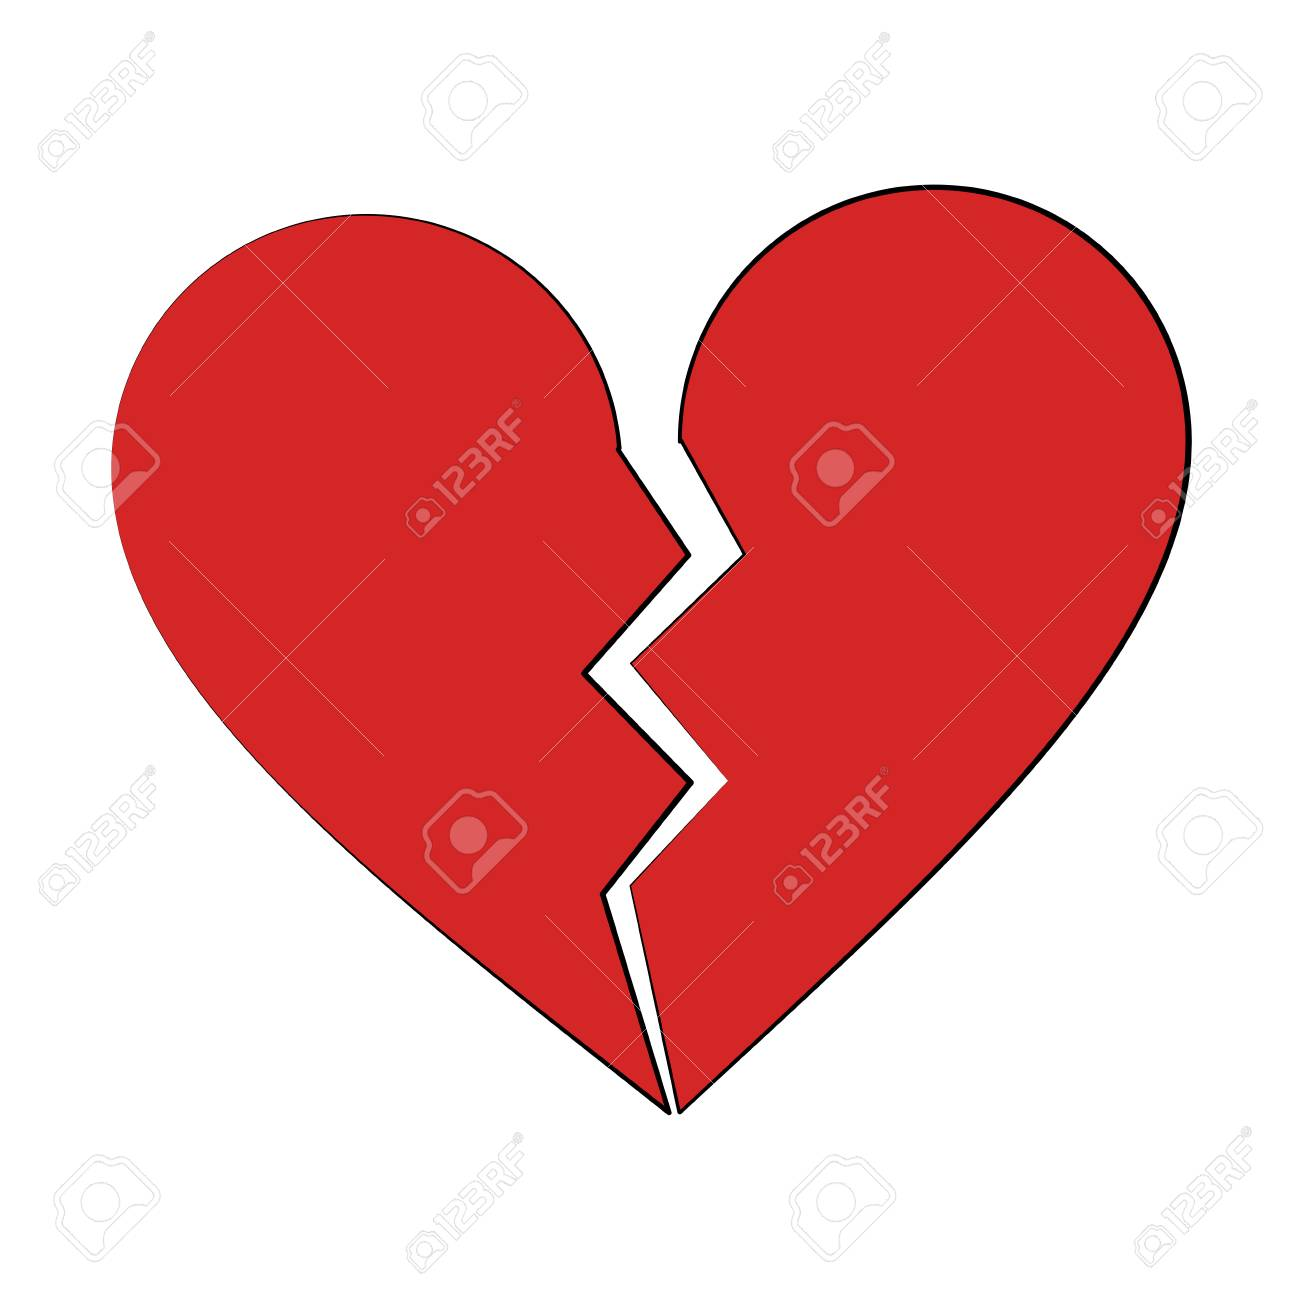 Coeur Brise Dessin Anime Icone Image Vector Illustration Design Clip